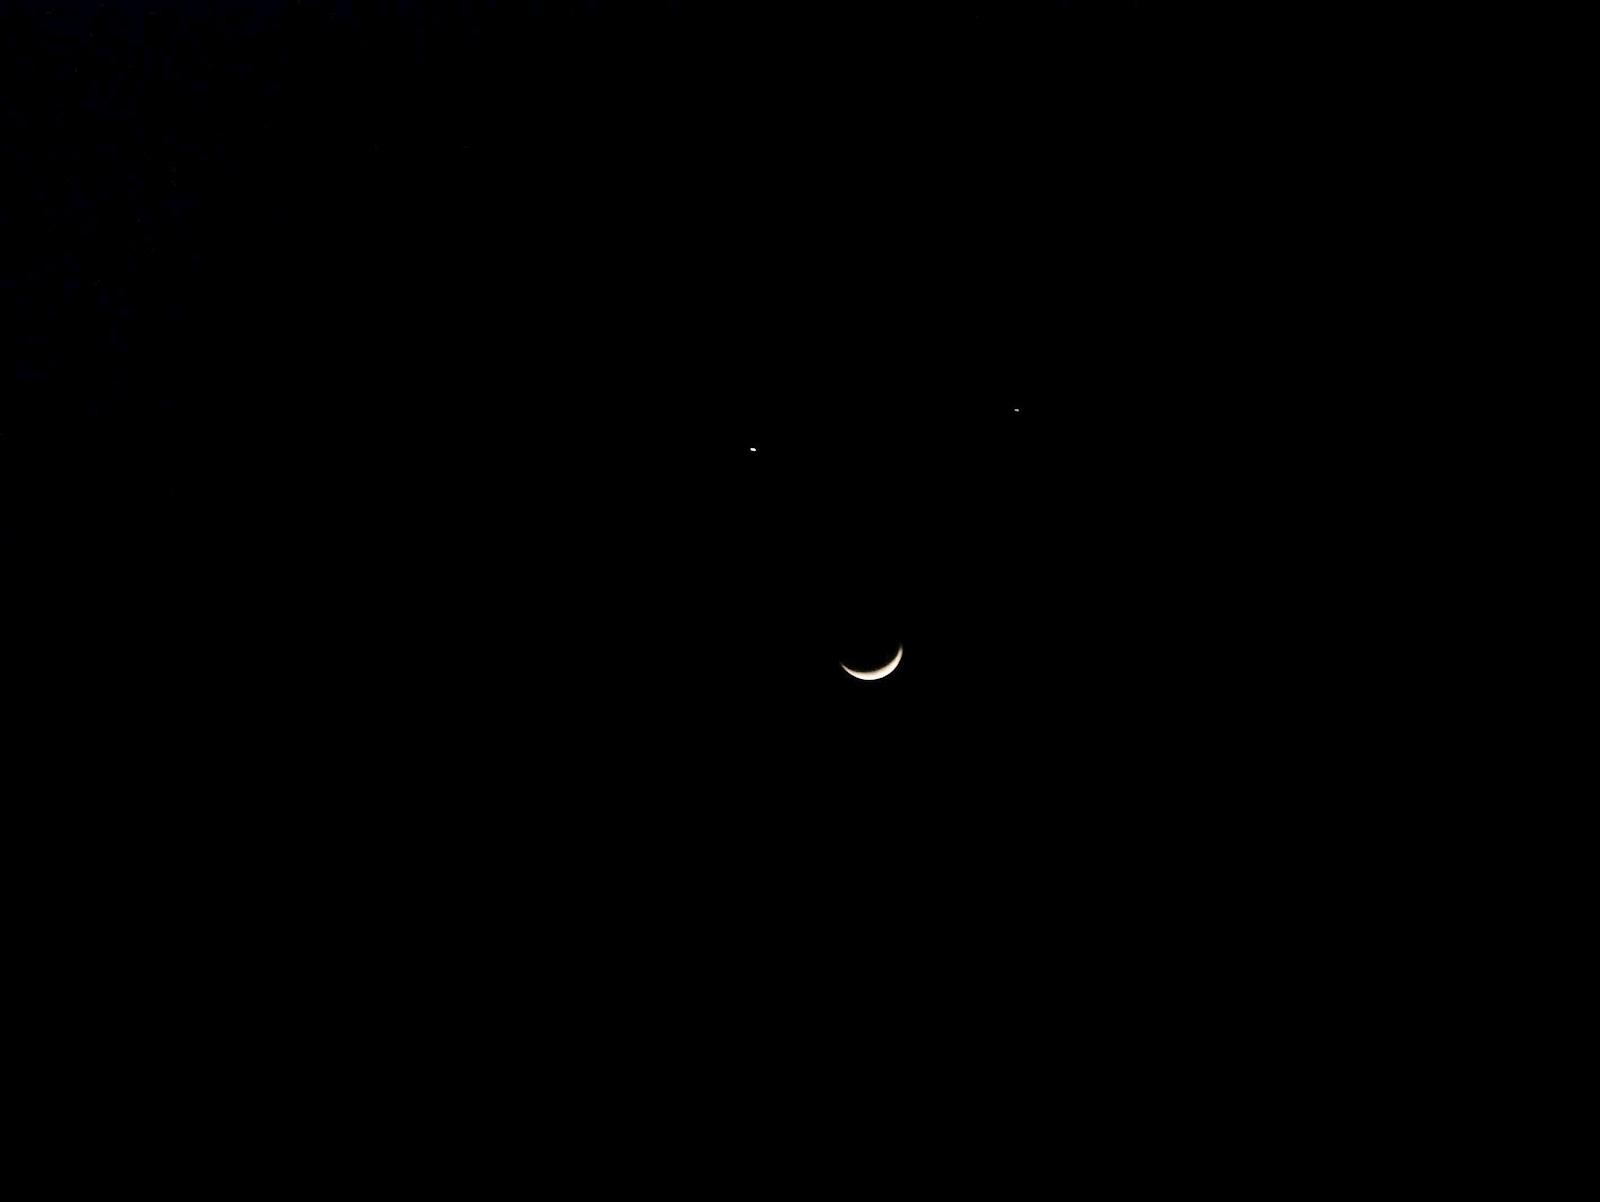 celestial smiley